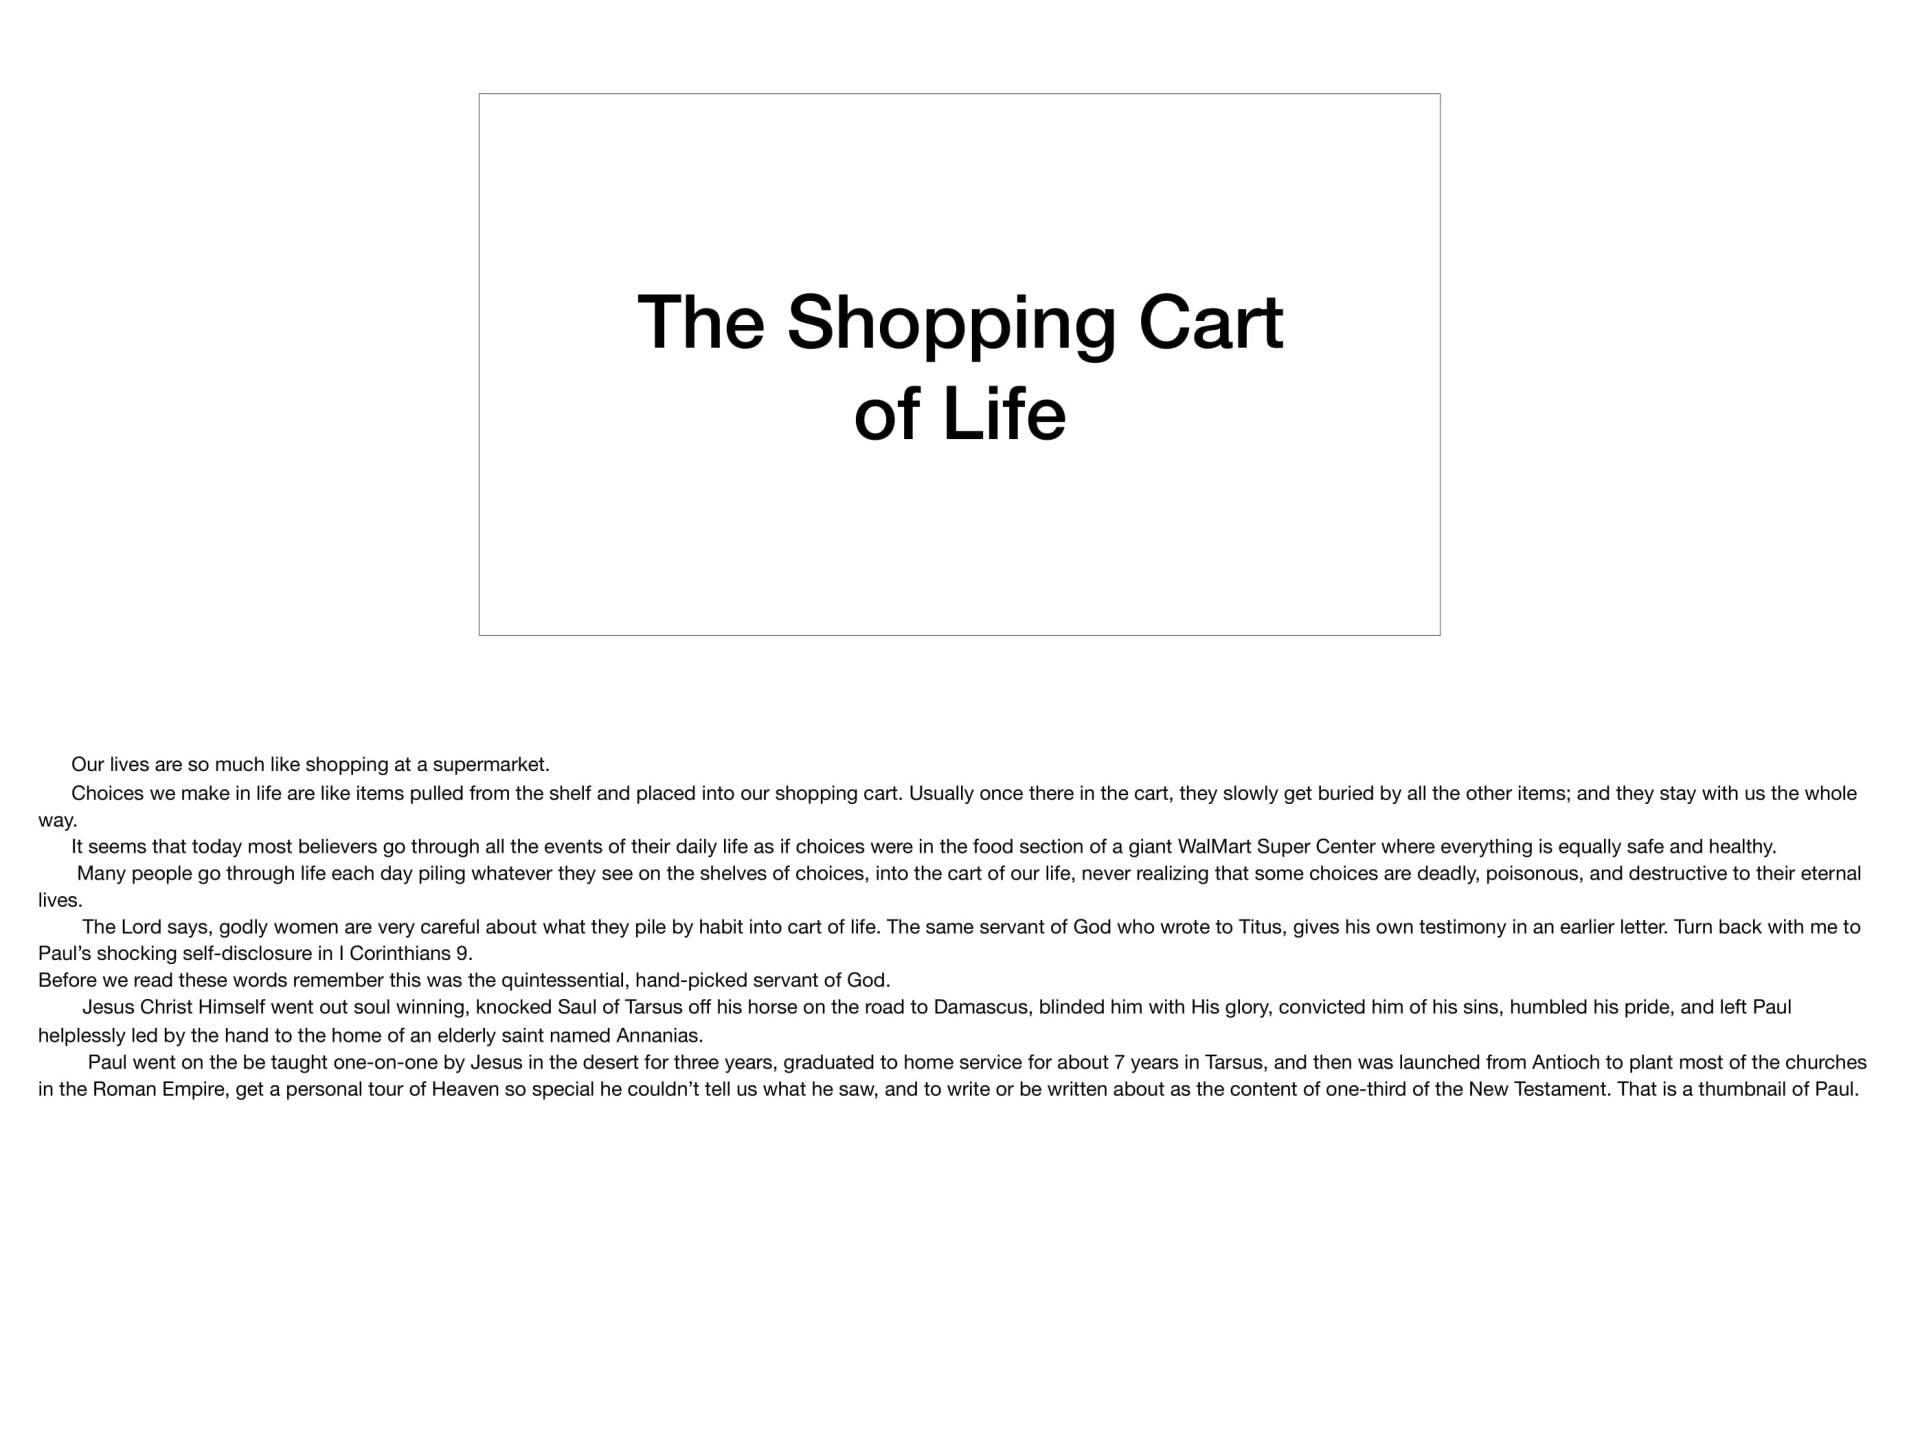 LGI-03 - Ladies Watch Your Shopping Cart-13